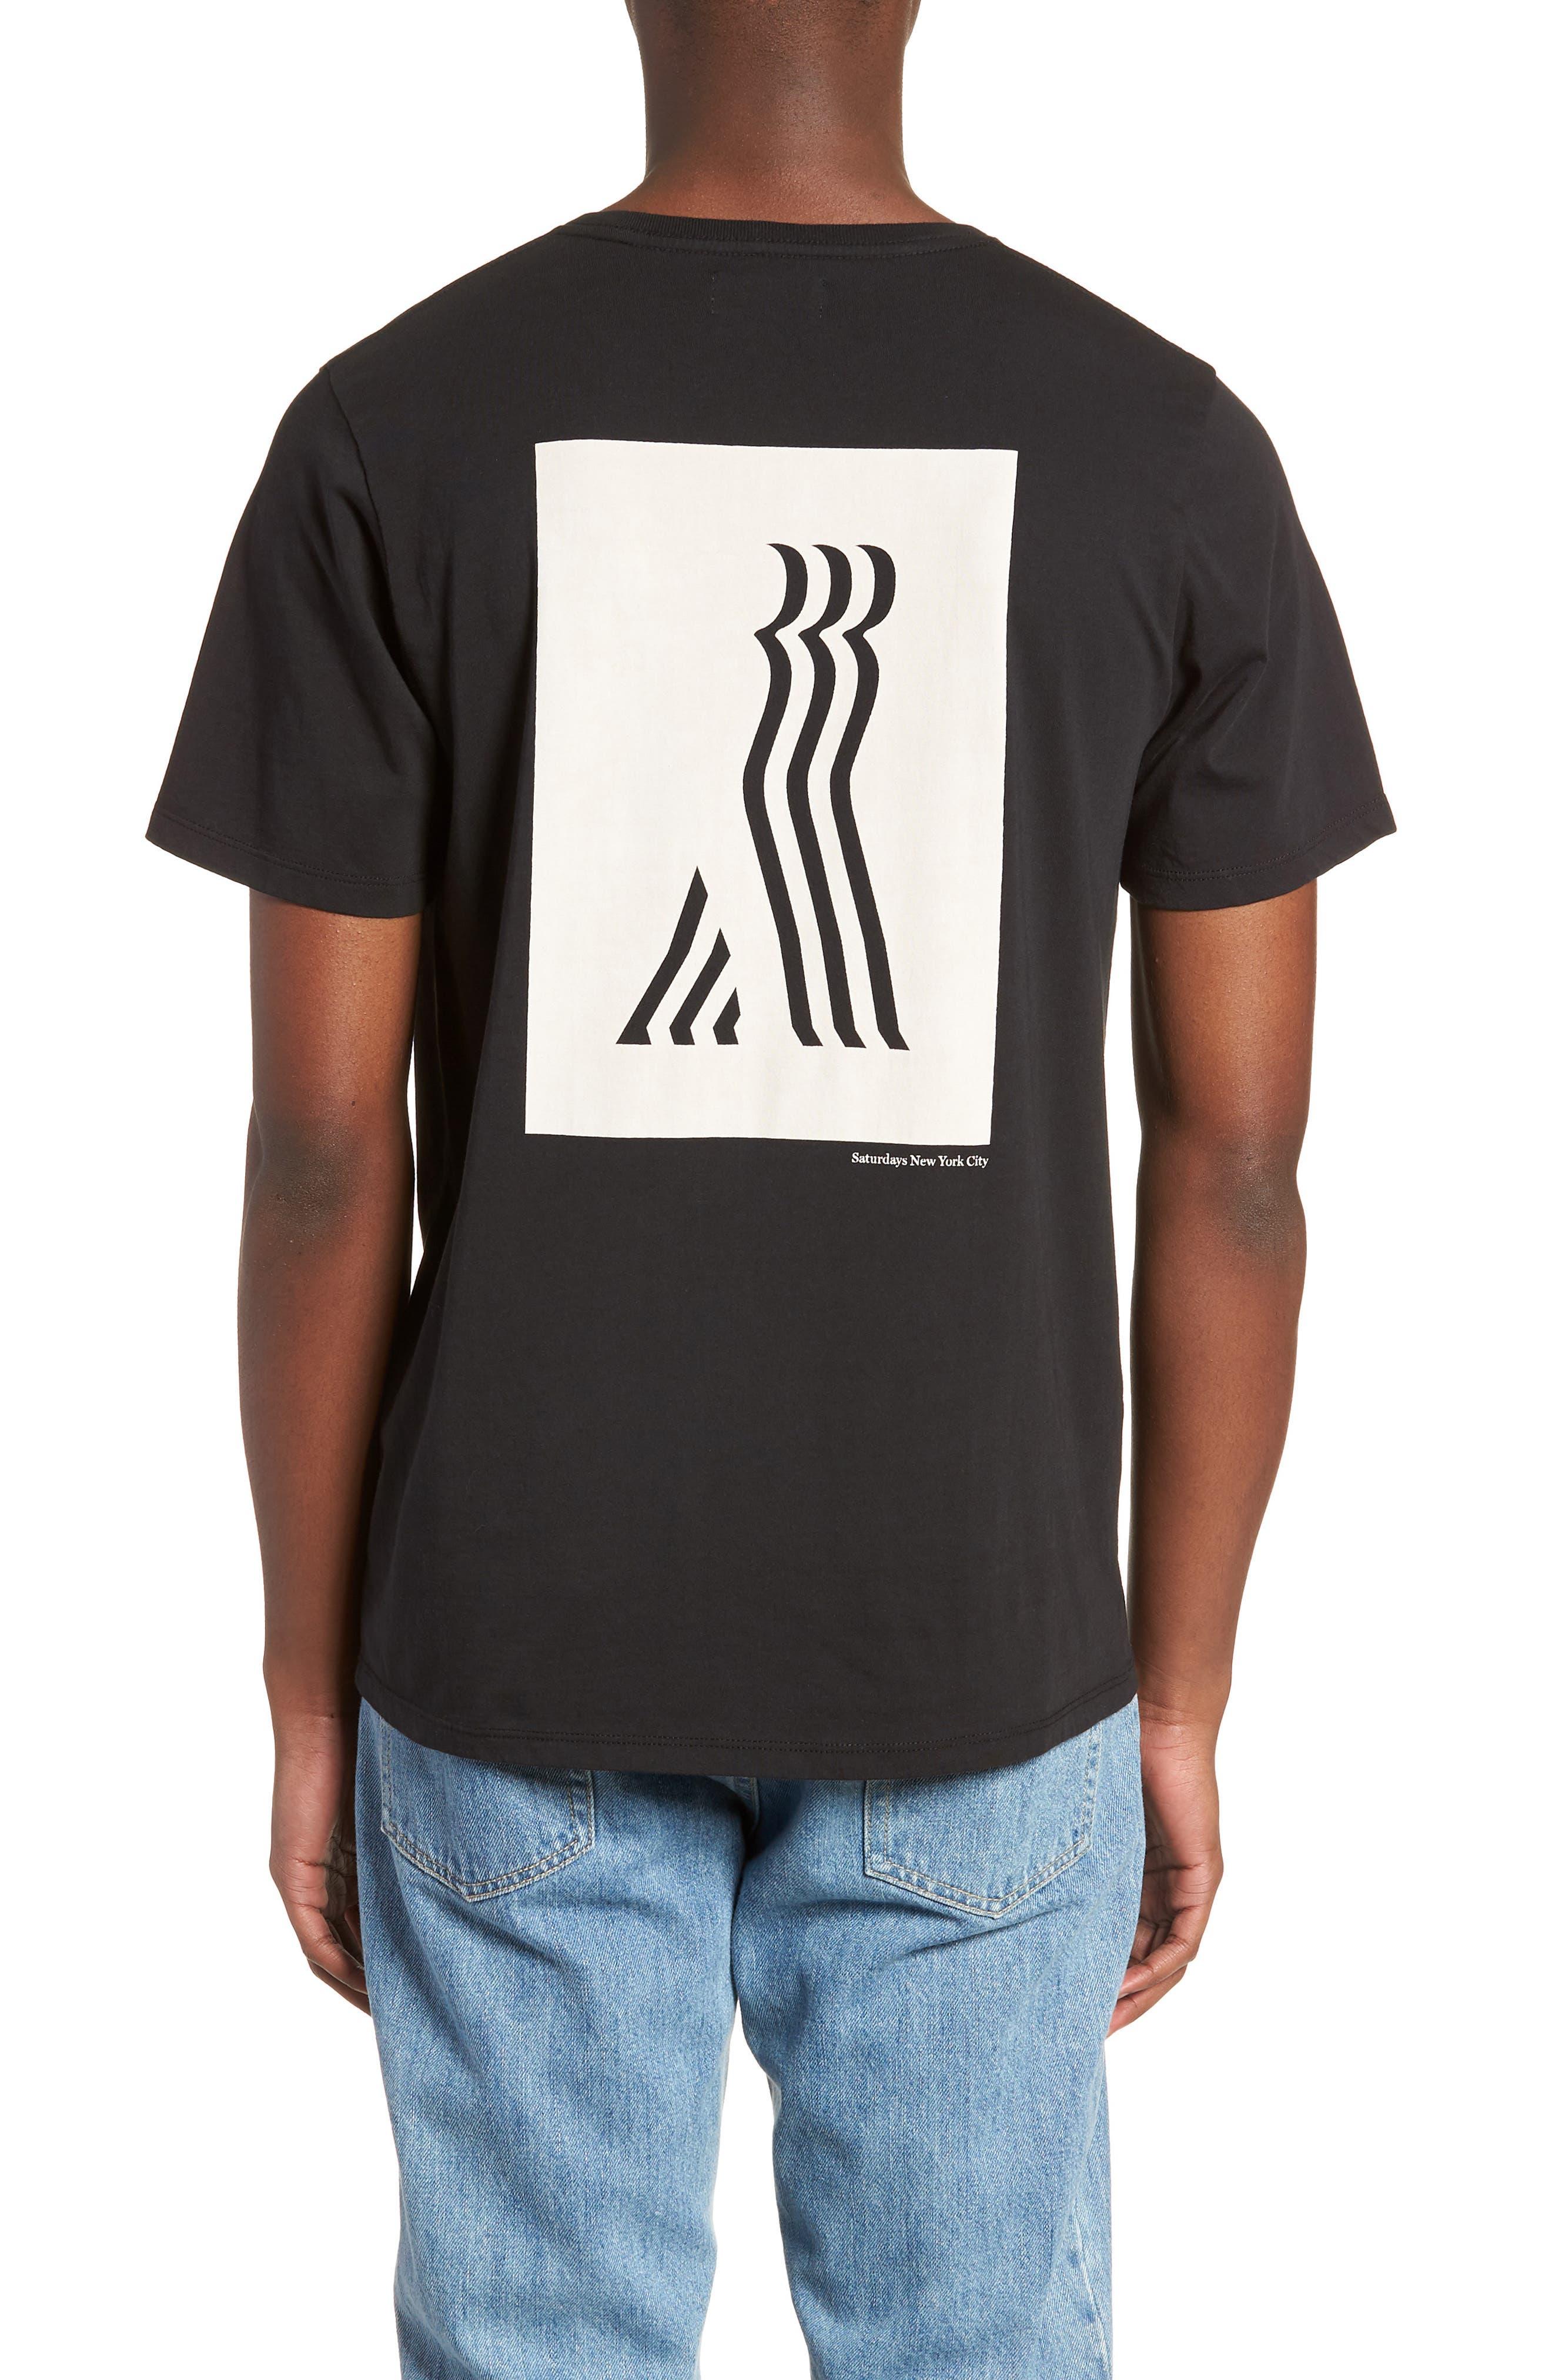 Walking Man T-Shirt,                             Alternate thumbnail 2, color,                             BLACK